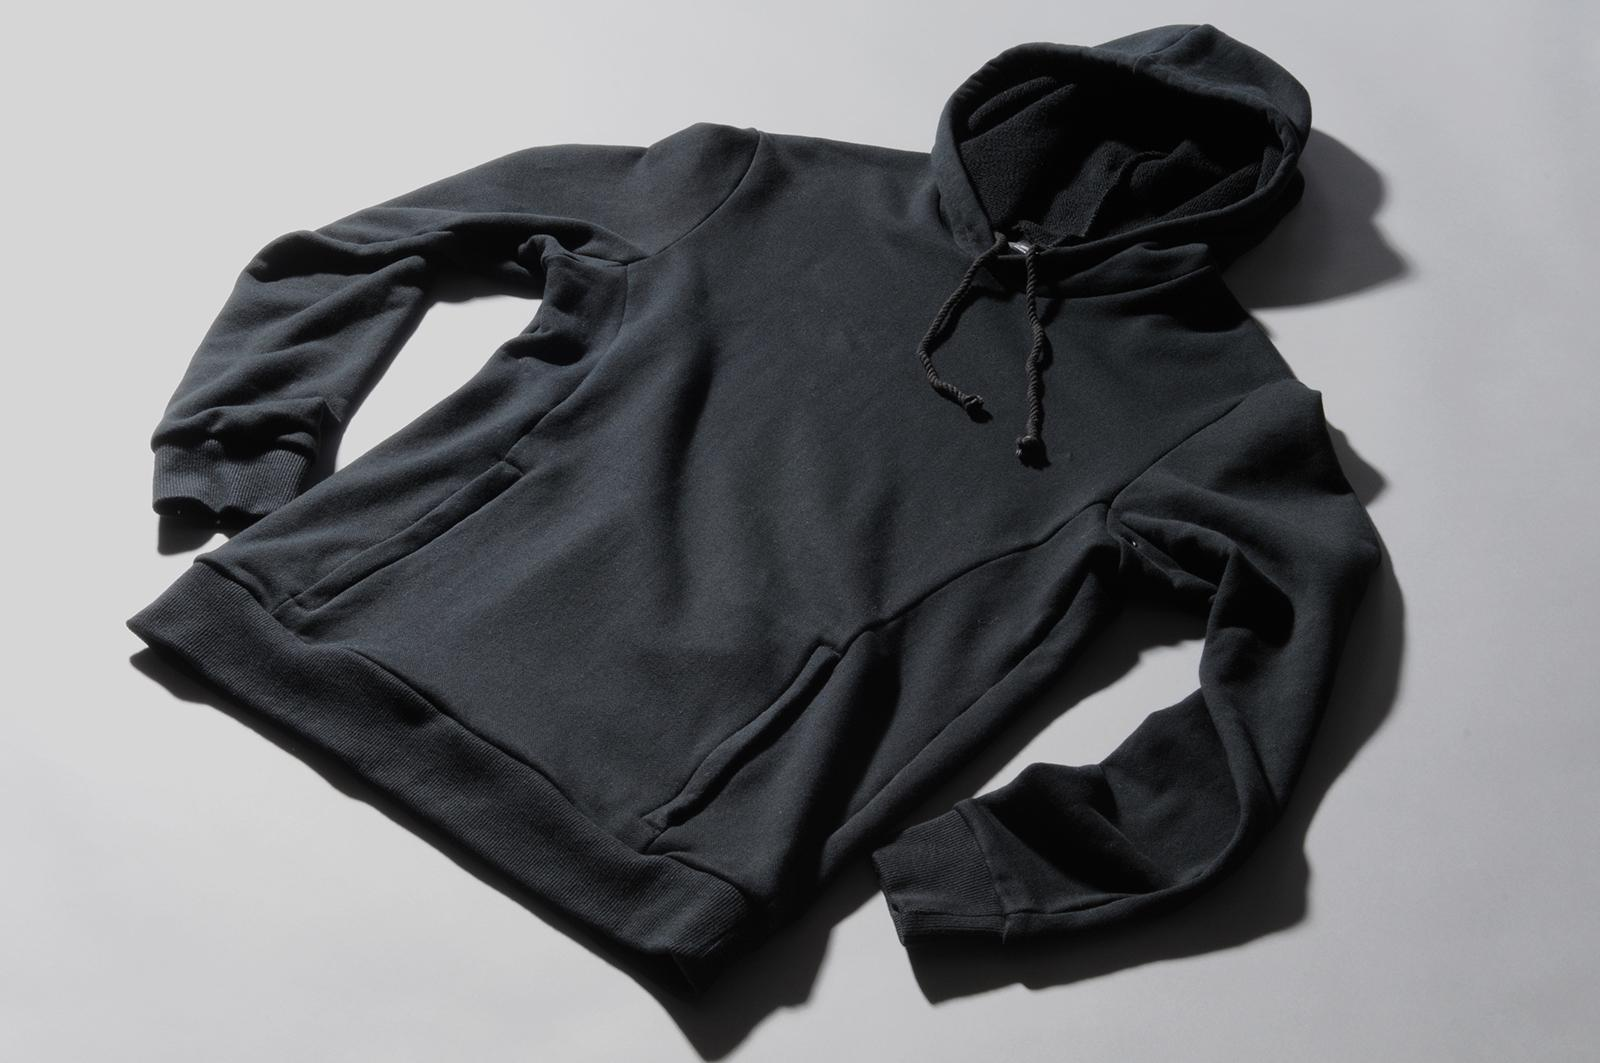 S1-Hooded-Riding Sweatshirt-Instagram - 1